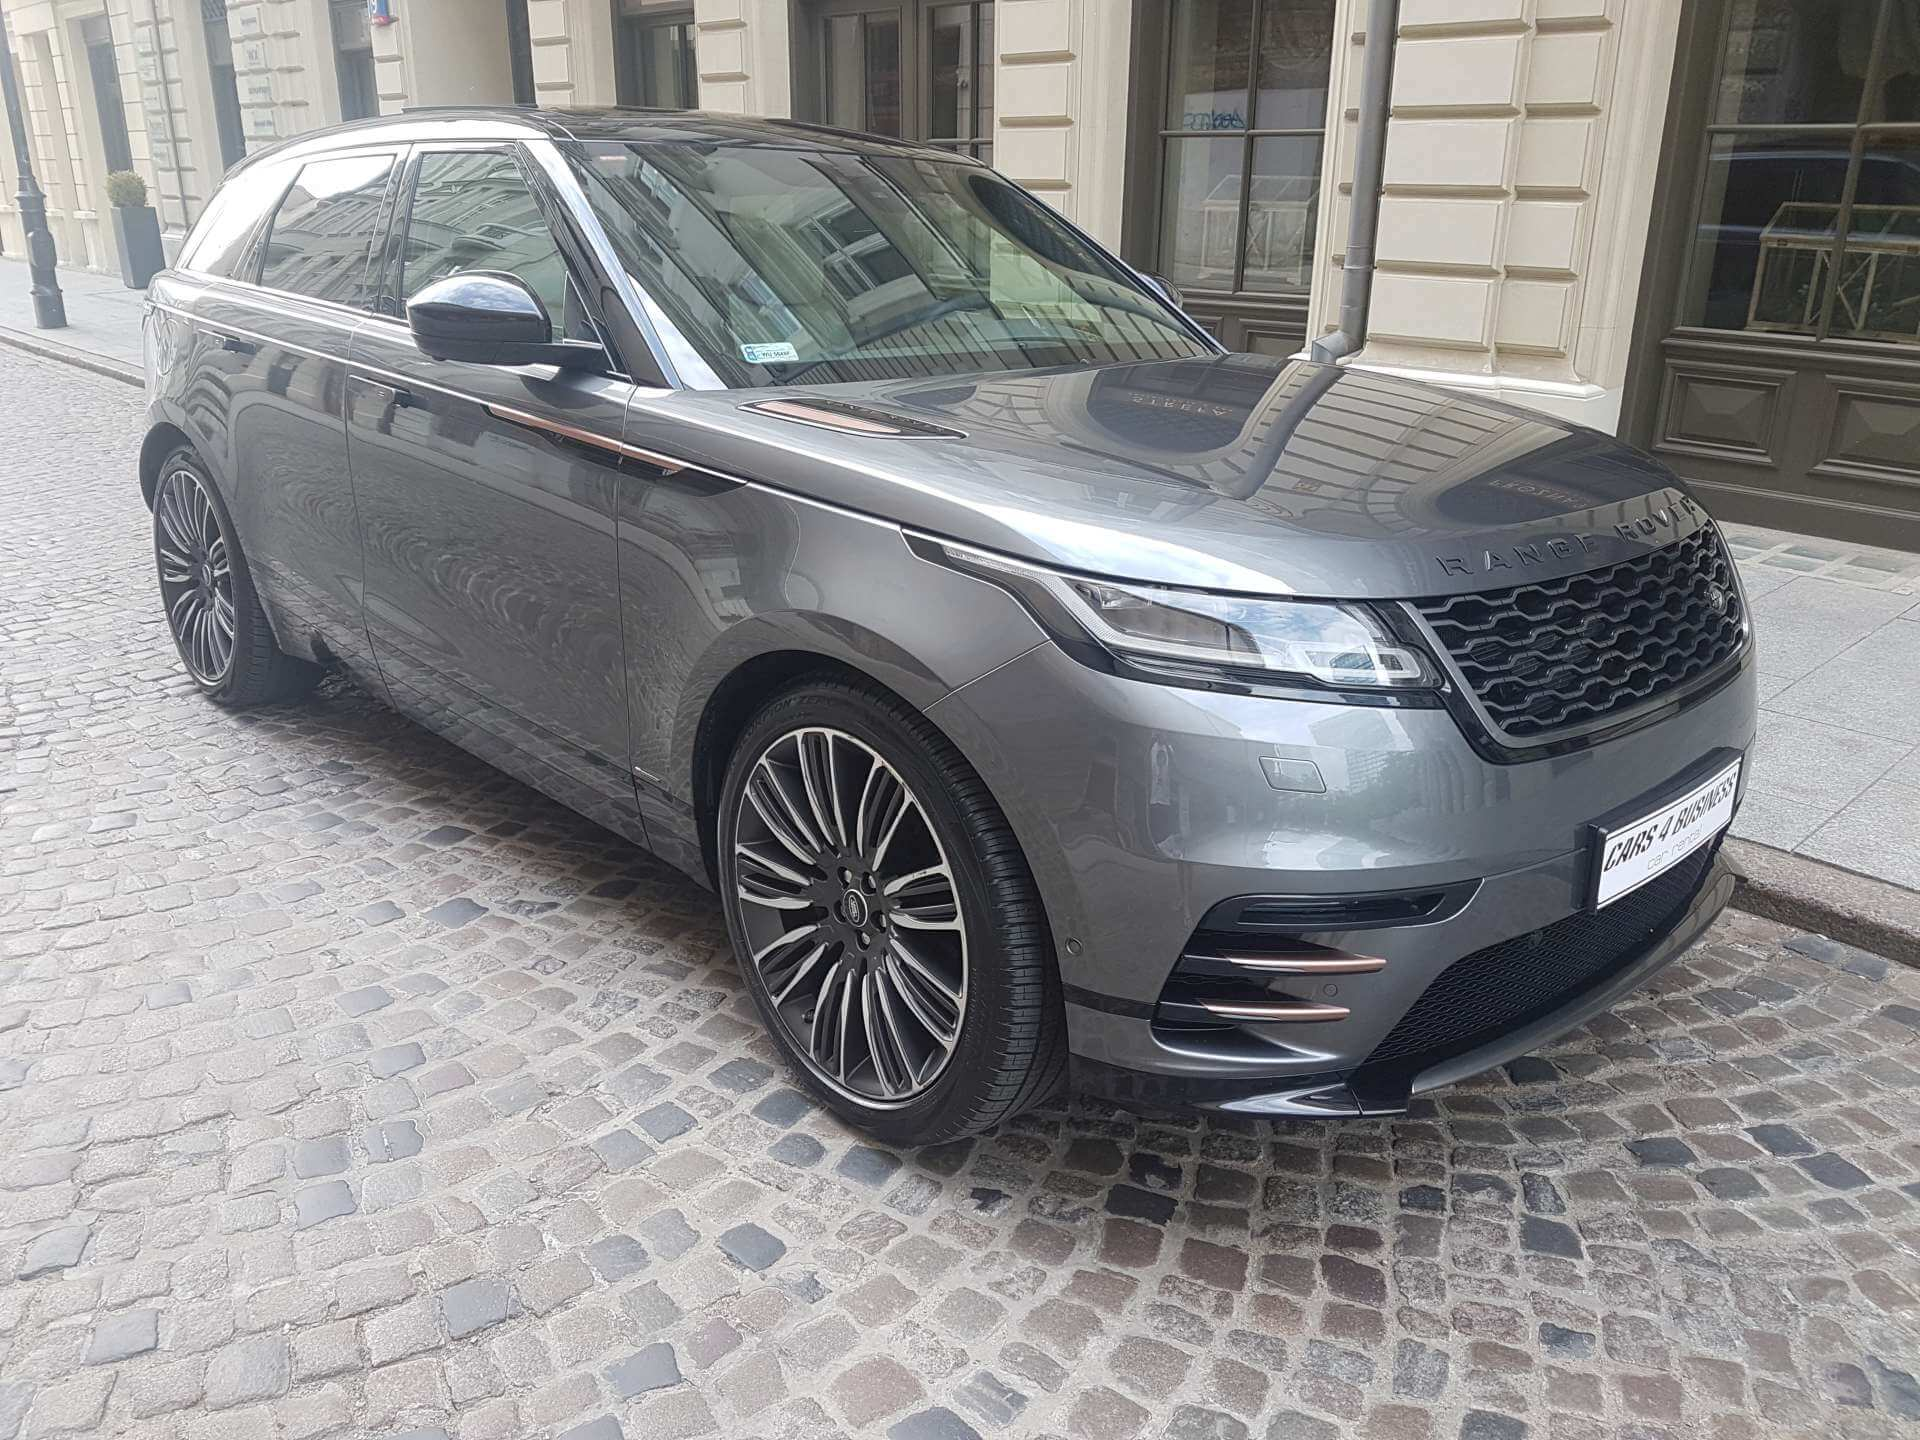 https://cars4business.pl/wp-content/uploads/2018/04/20180429_0820271.jpg